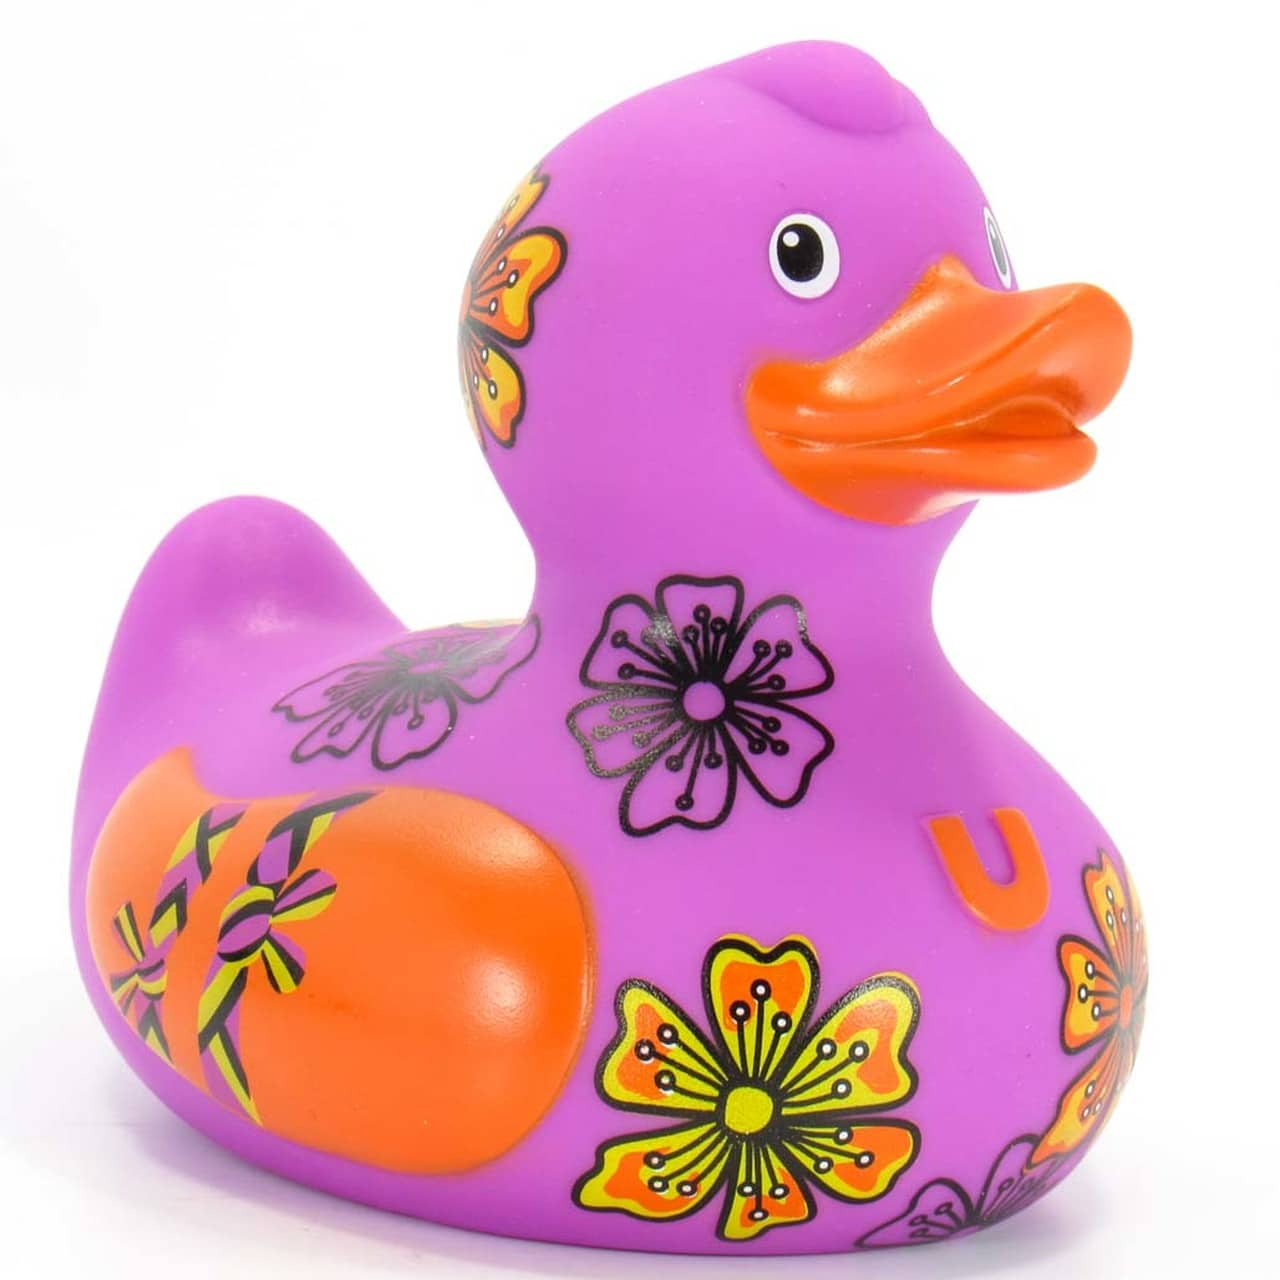 Friend Ship Rubber Duck